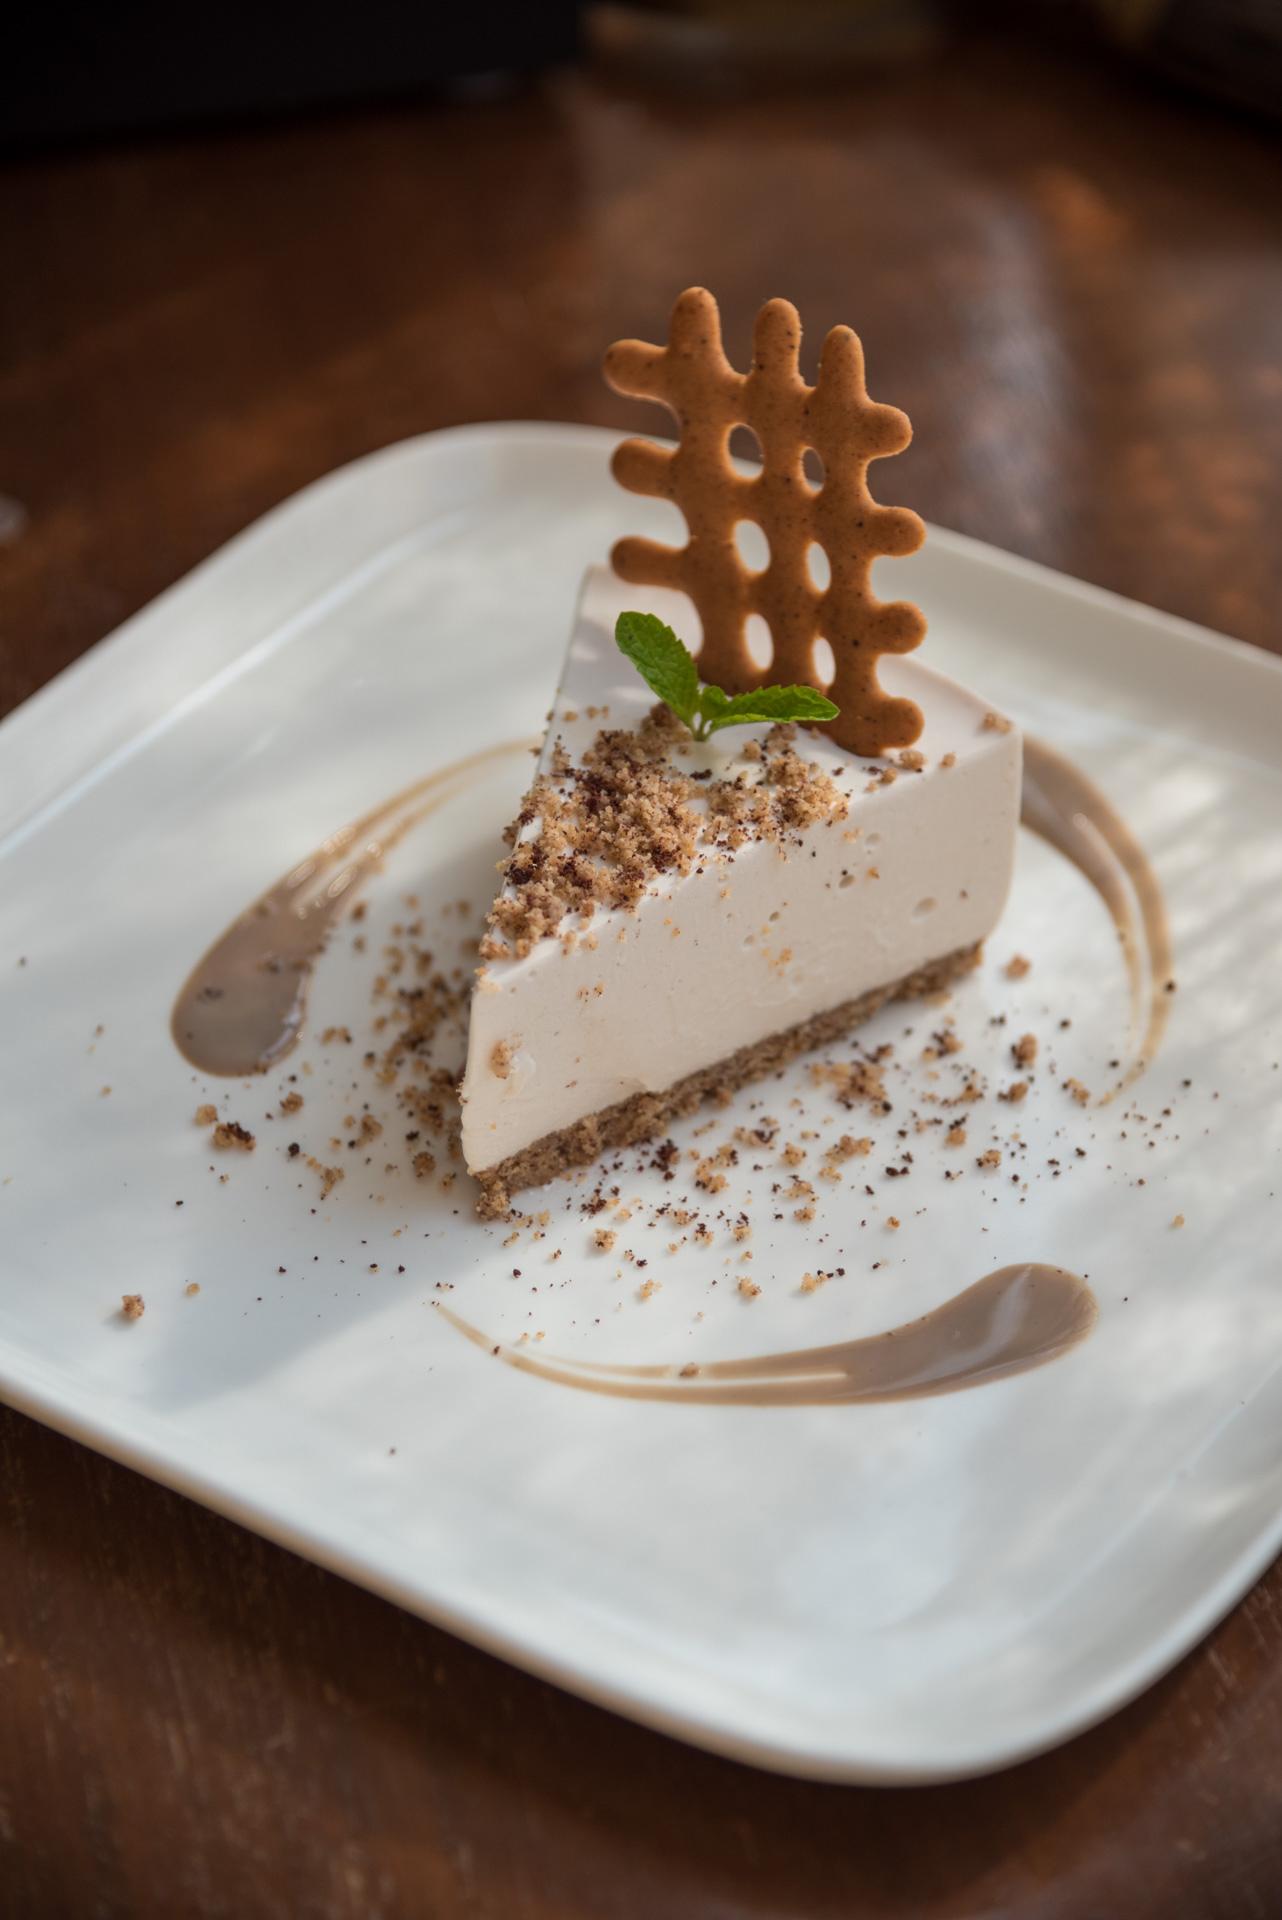 Cacao Nib and Soya Milk Cheese Cake with a Nachini Crust/©Smoke House Deli